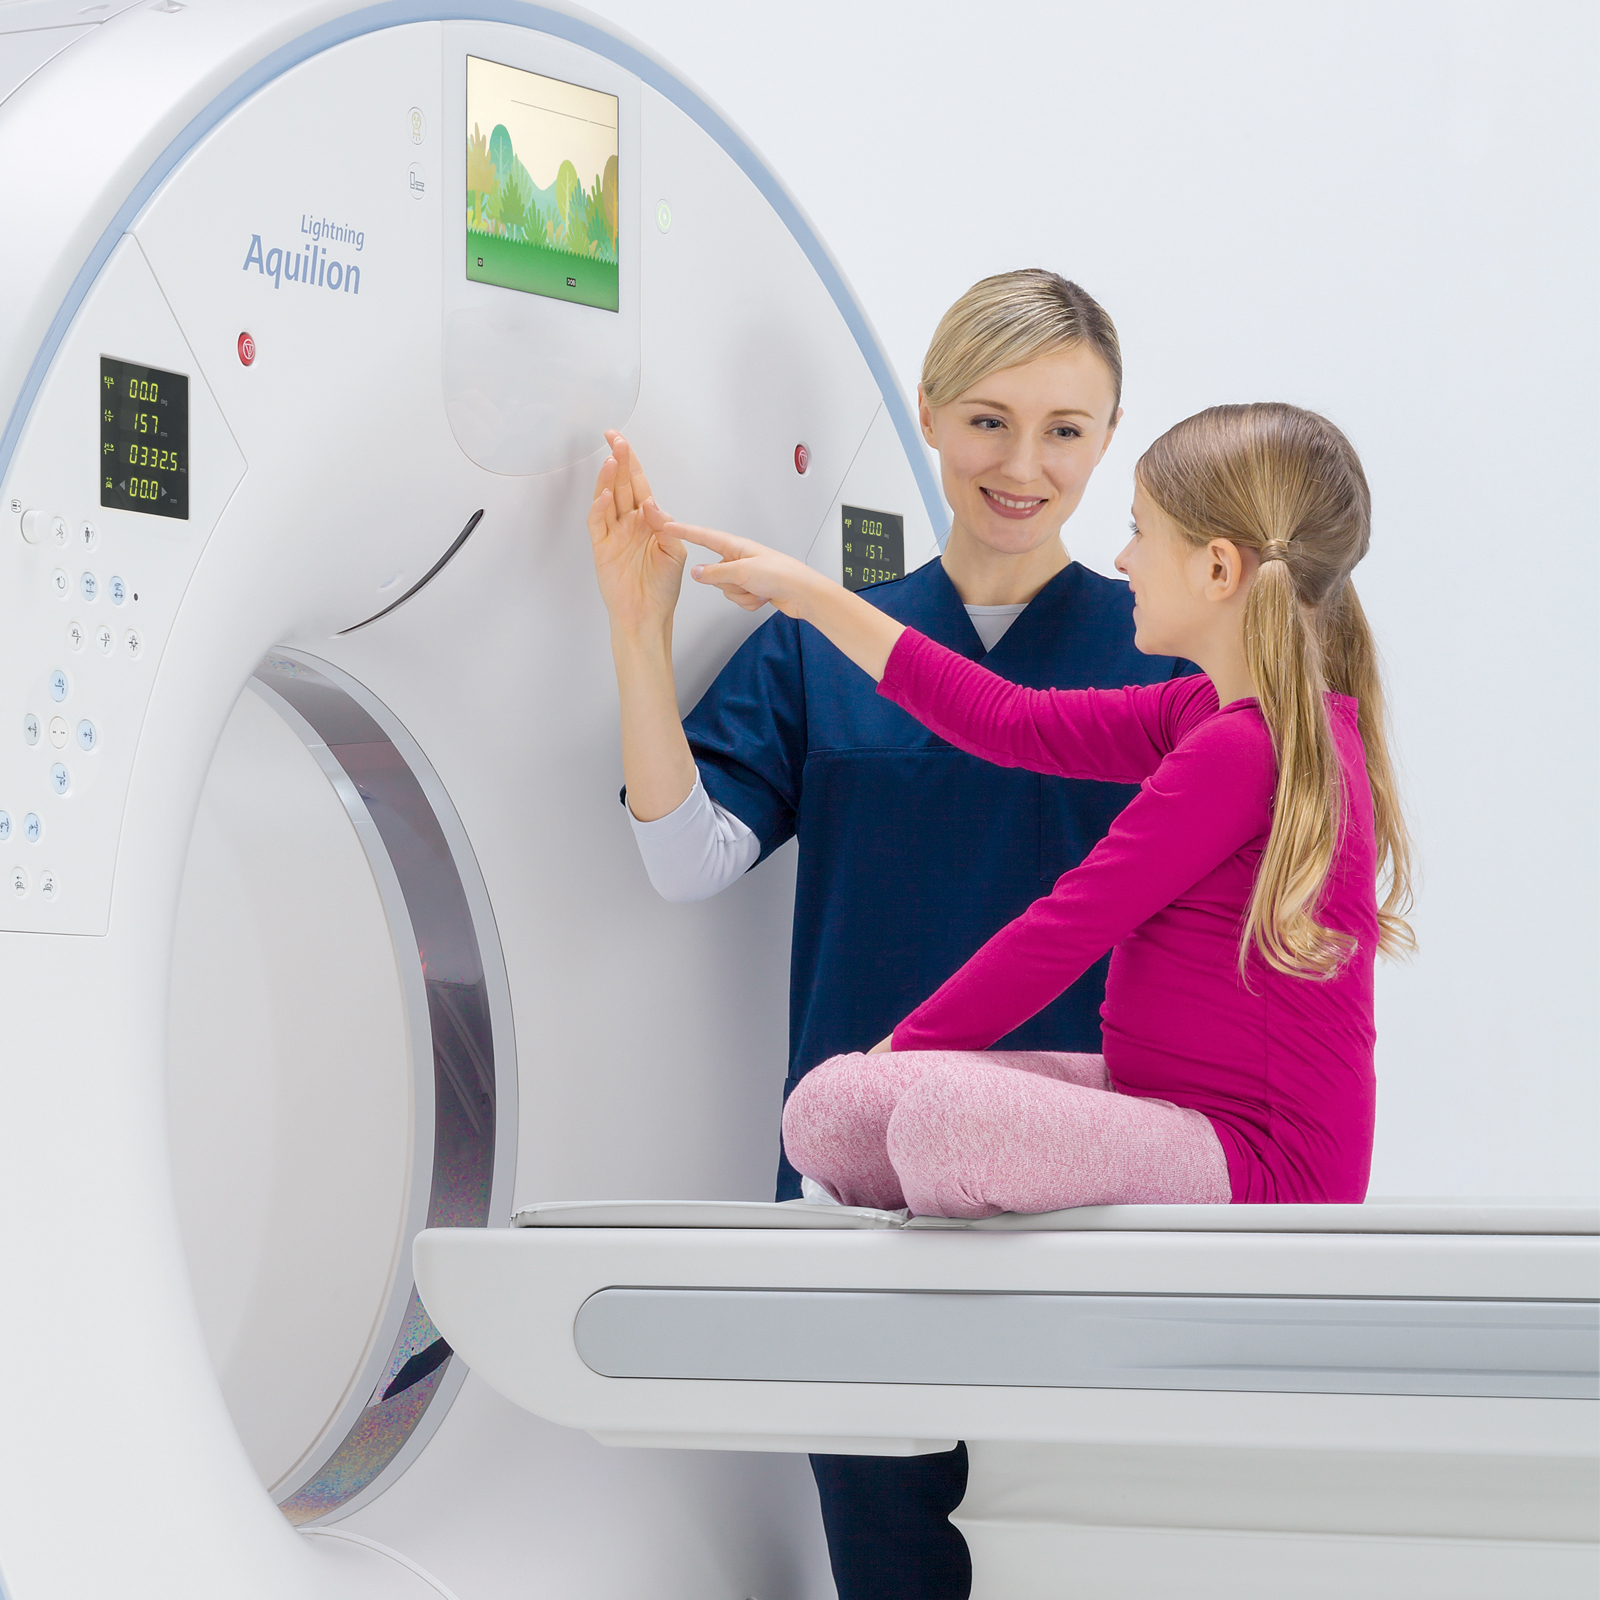 Toshiba Aquilion Lightning CT Scanner